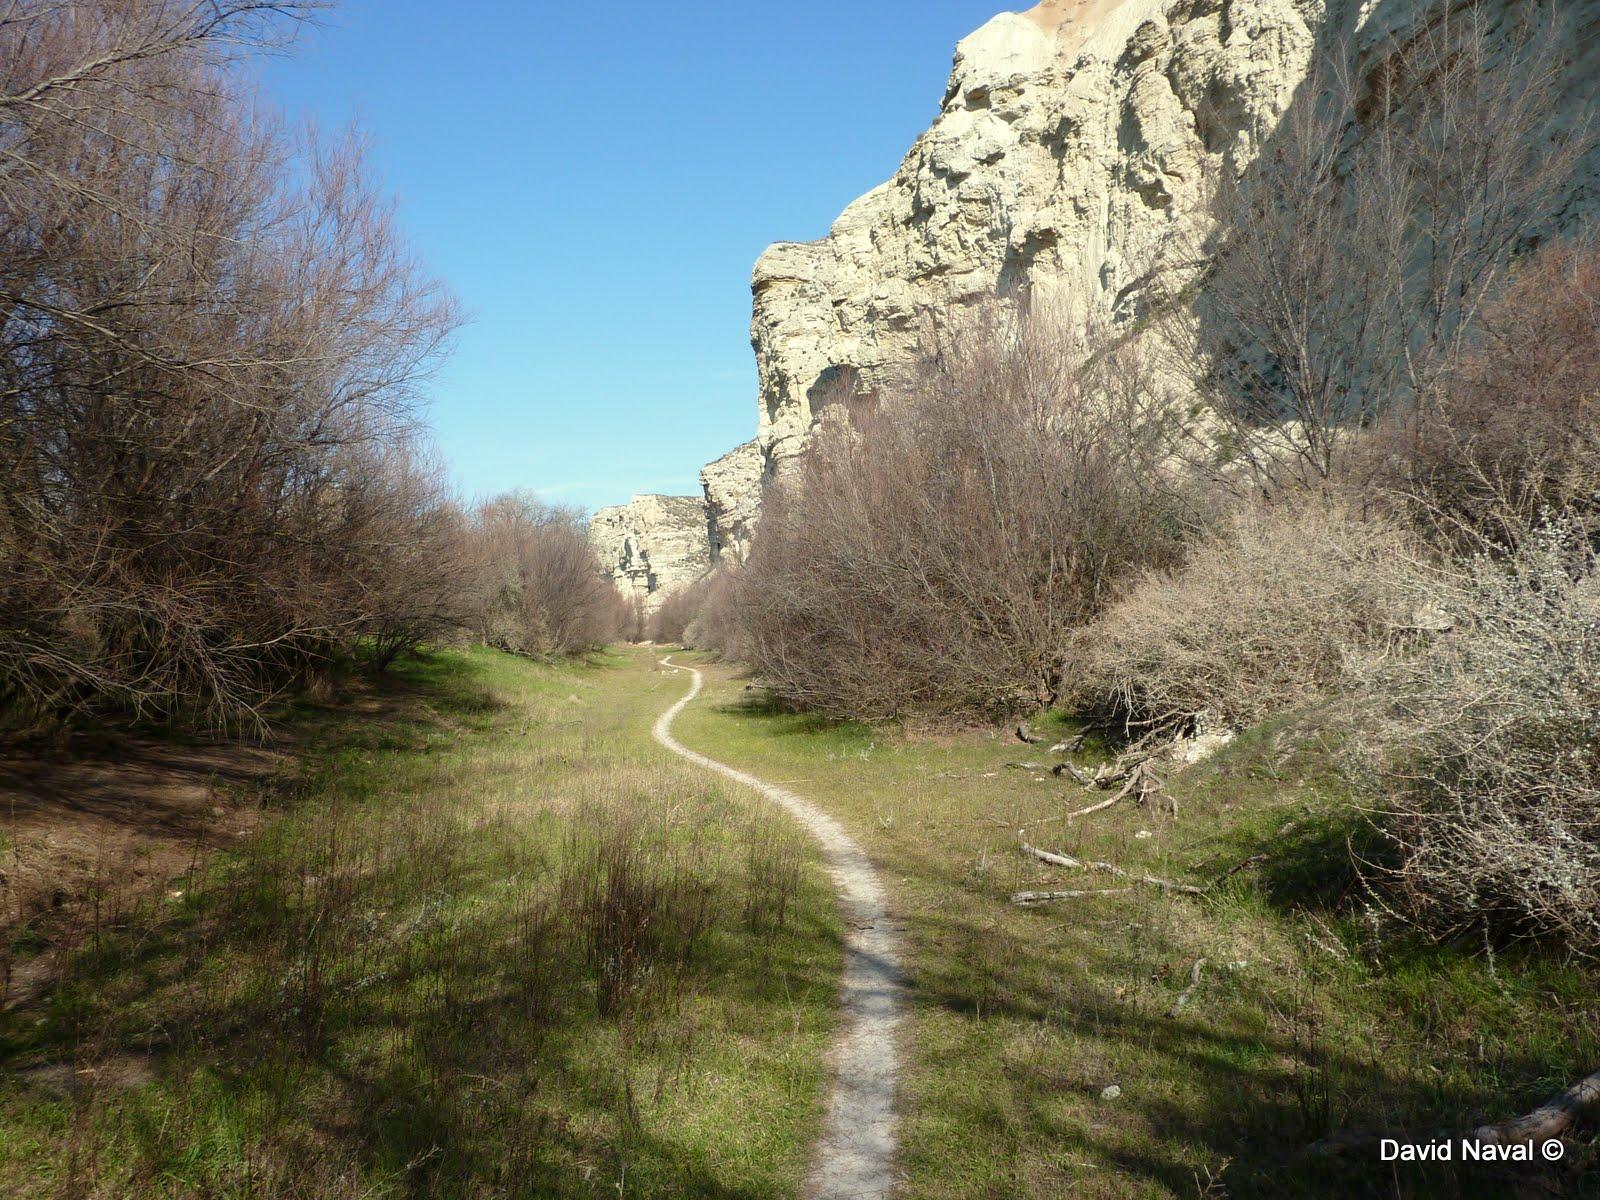 Paseo en bicicleta 02 - 3 part 3